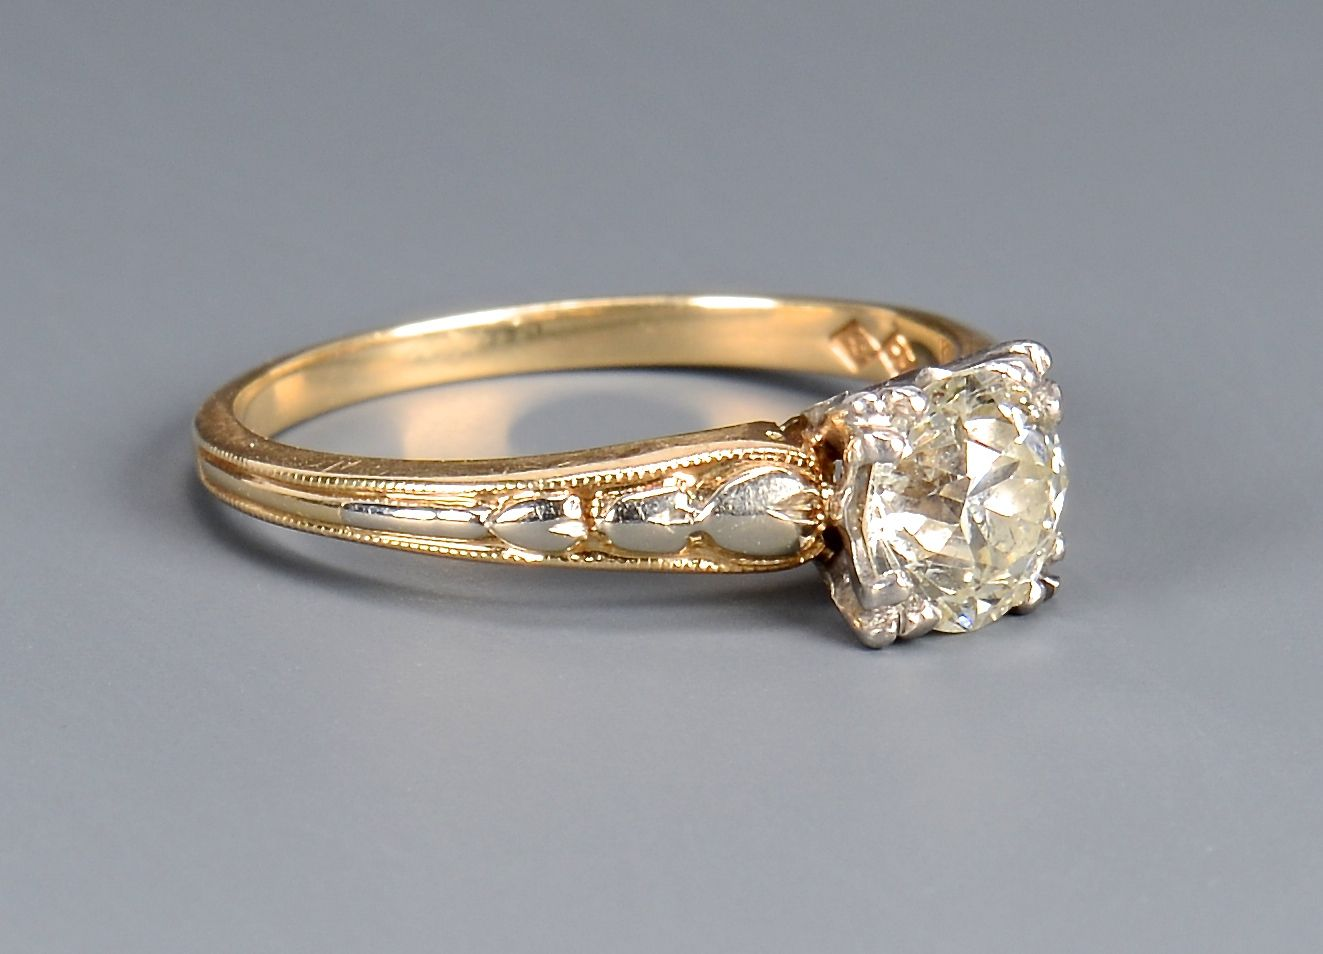 Vintage Wedding Rings 1800 Google Search Wedding Rings Vintage Wedding Rings Engagement Rings